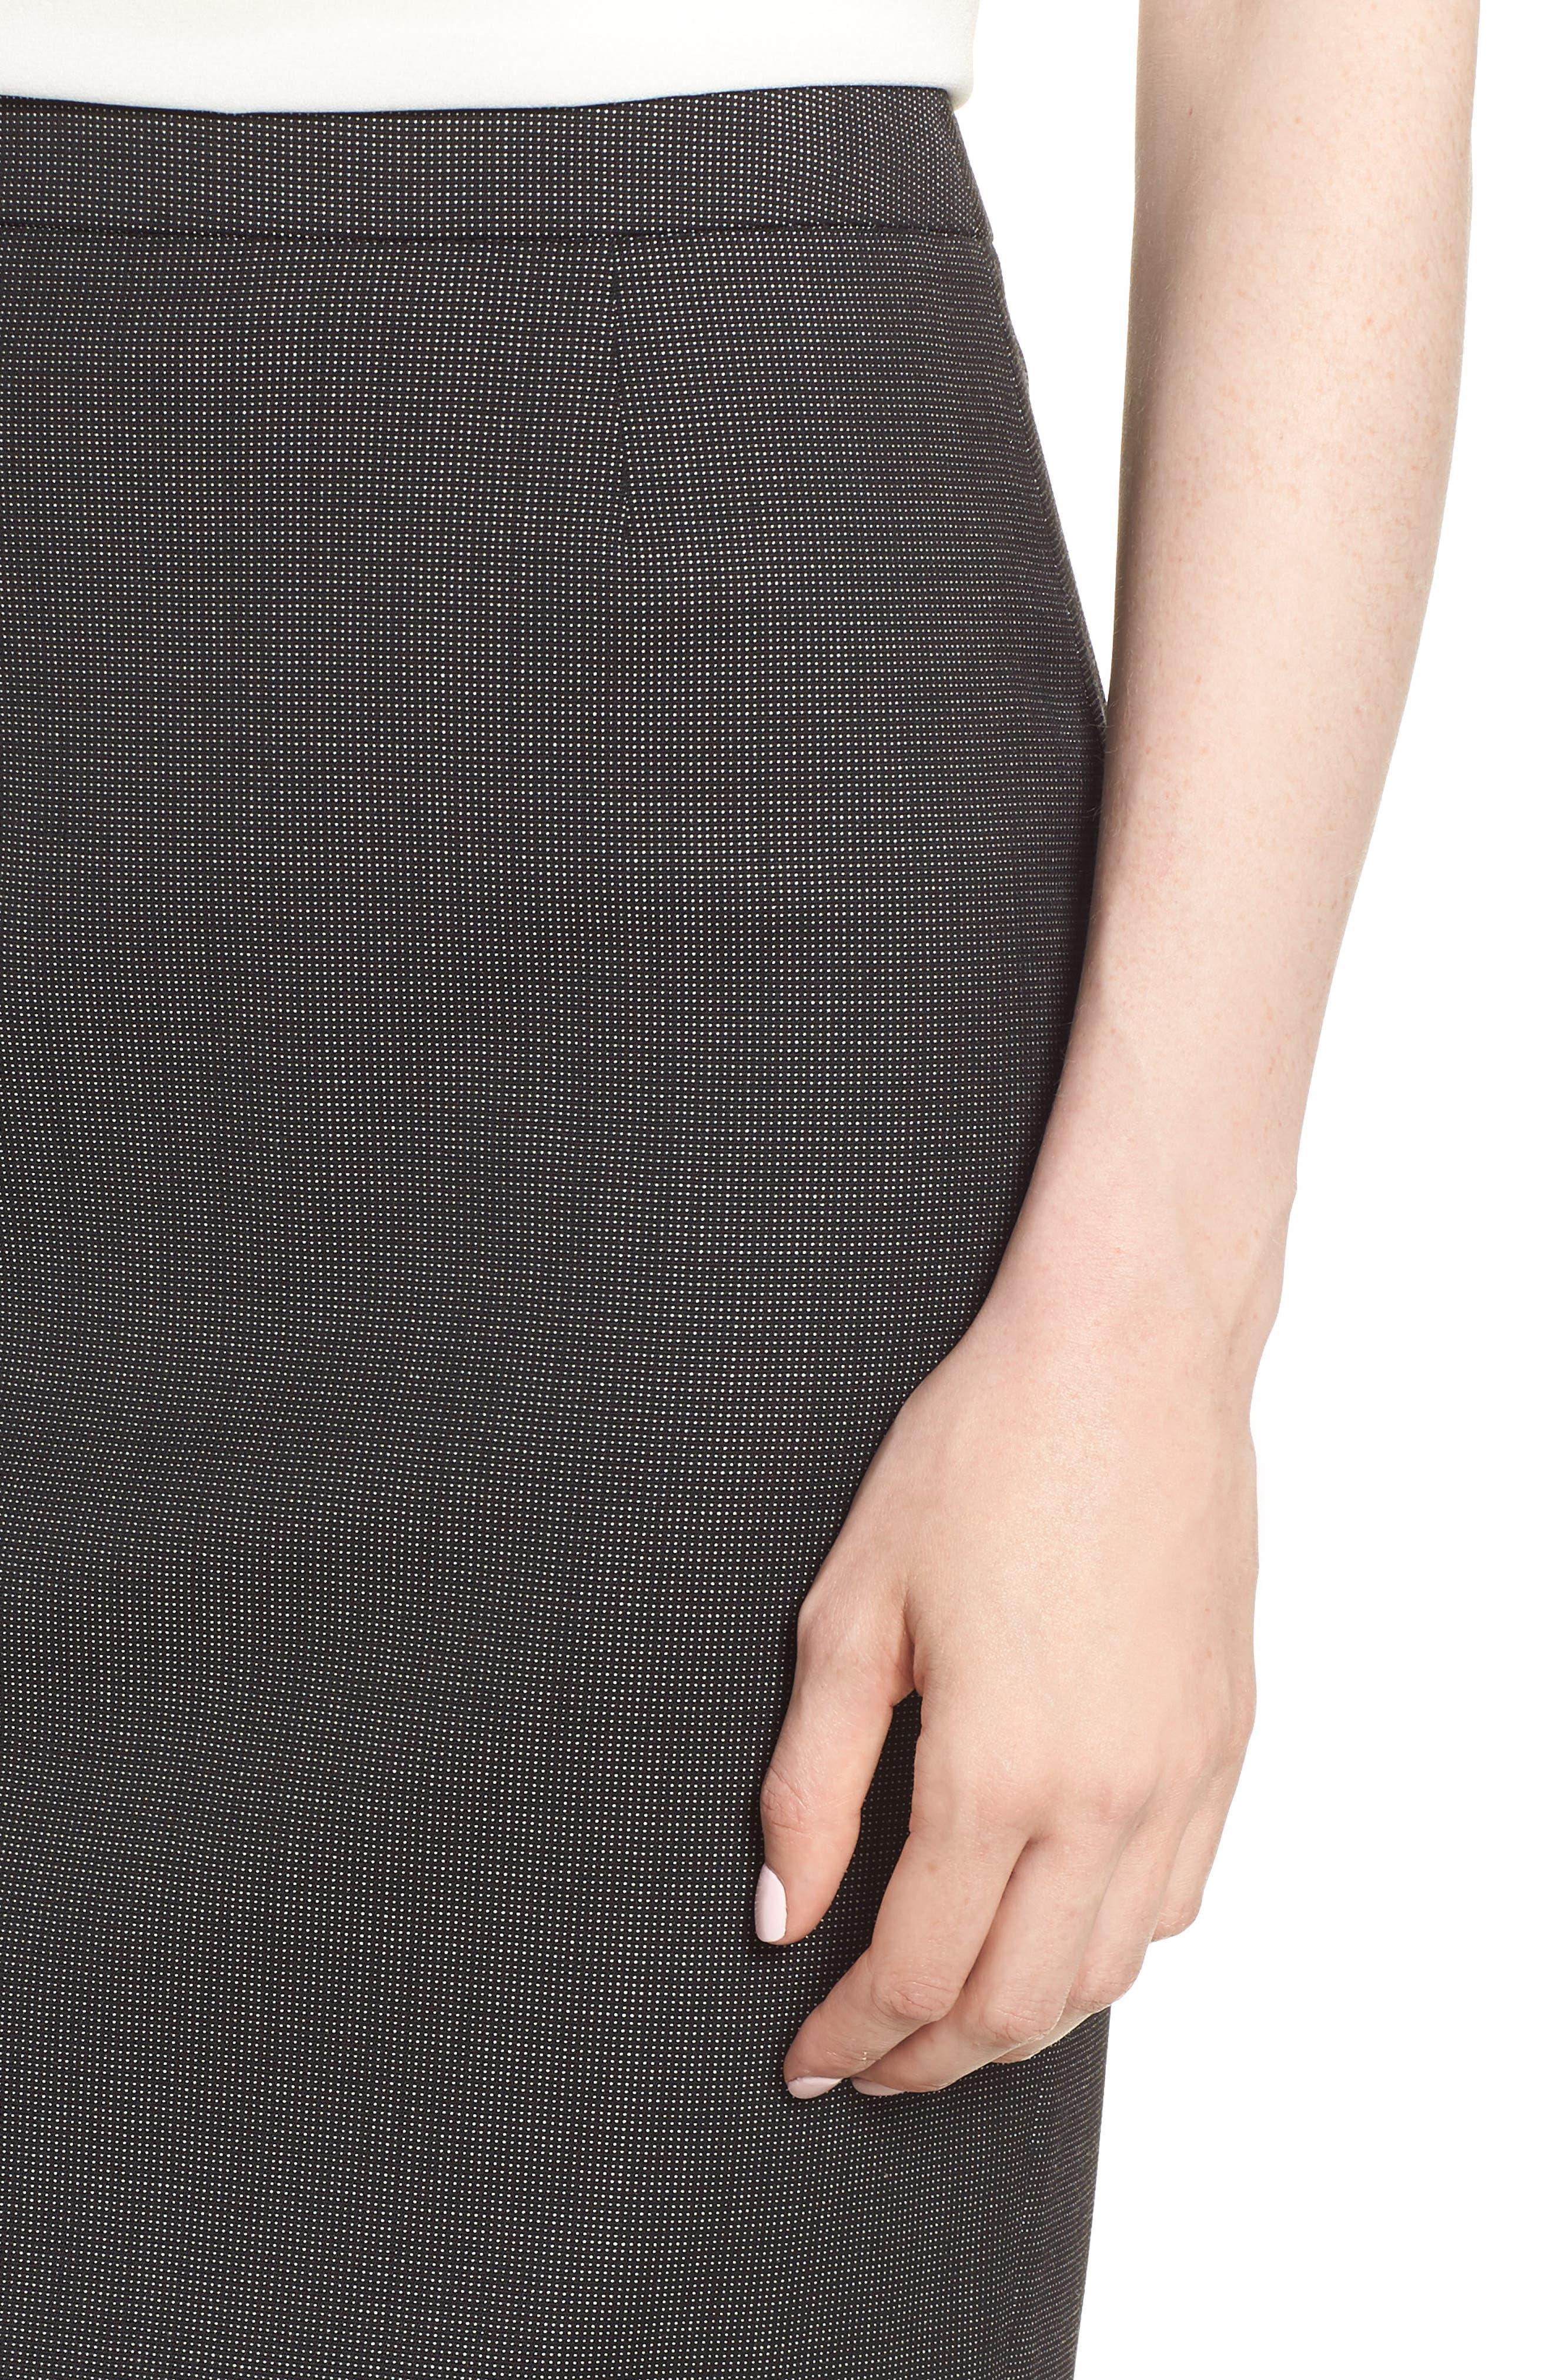 Vimena Stretch Wool Blend Suit Skirt,                             Alternate thumbnail 4, color,                             009